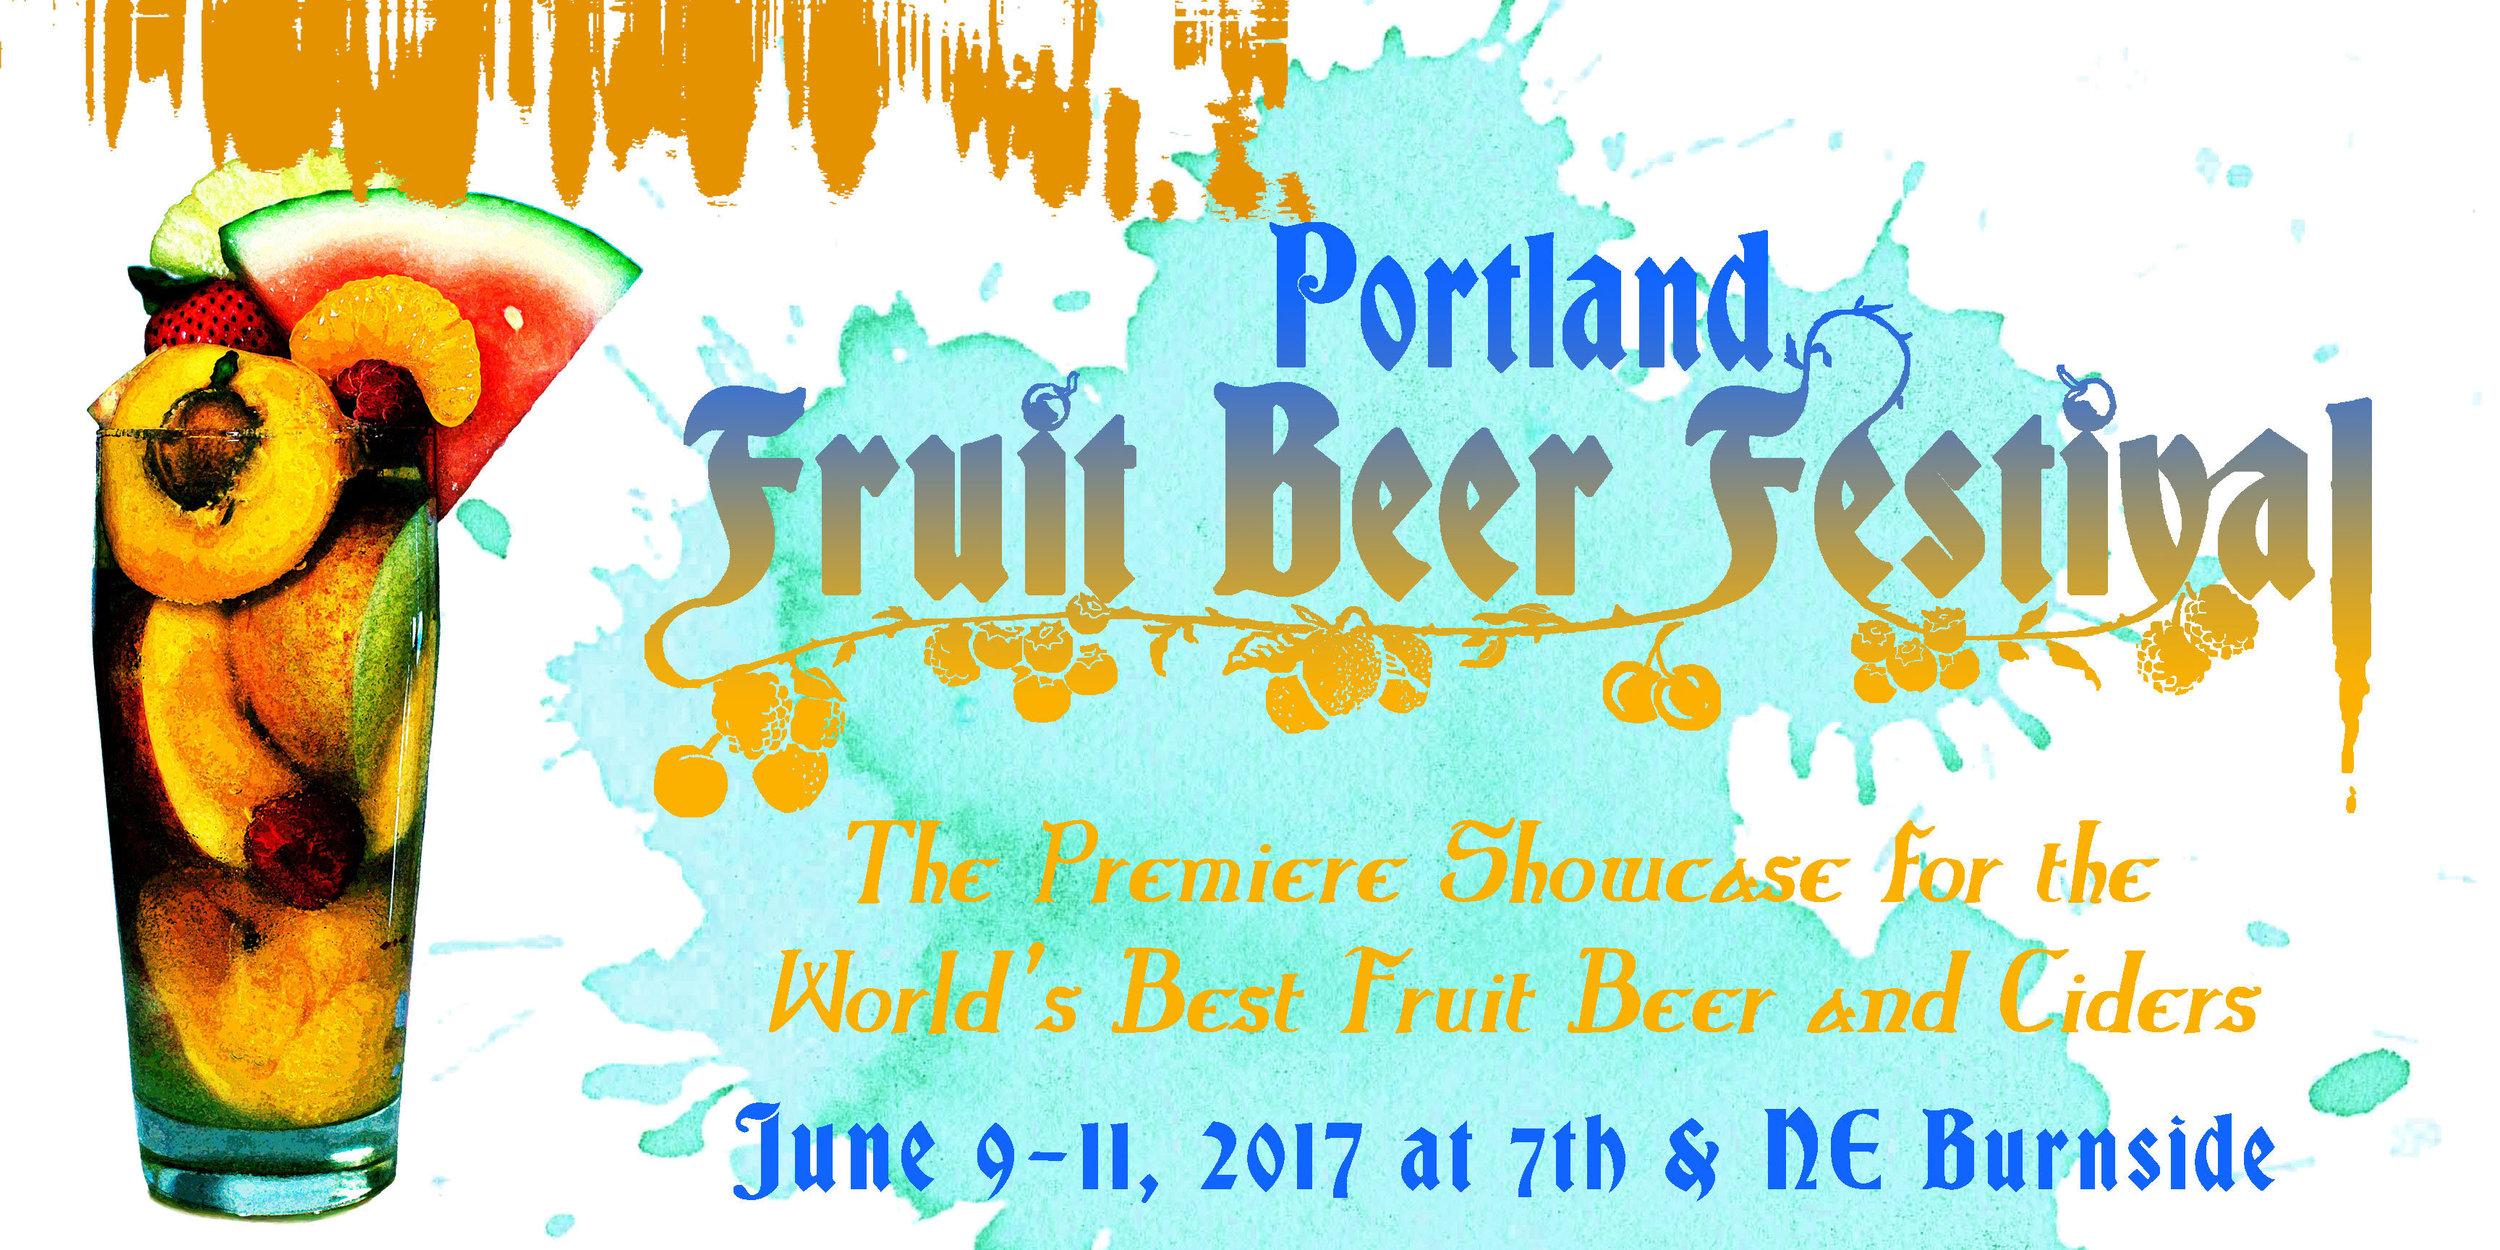 FruitBeerFest2017